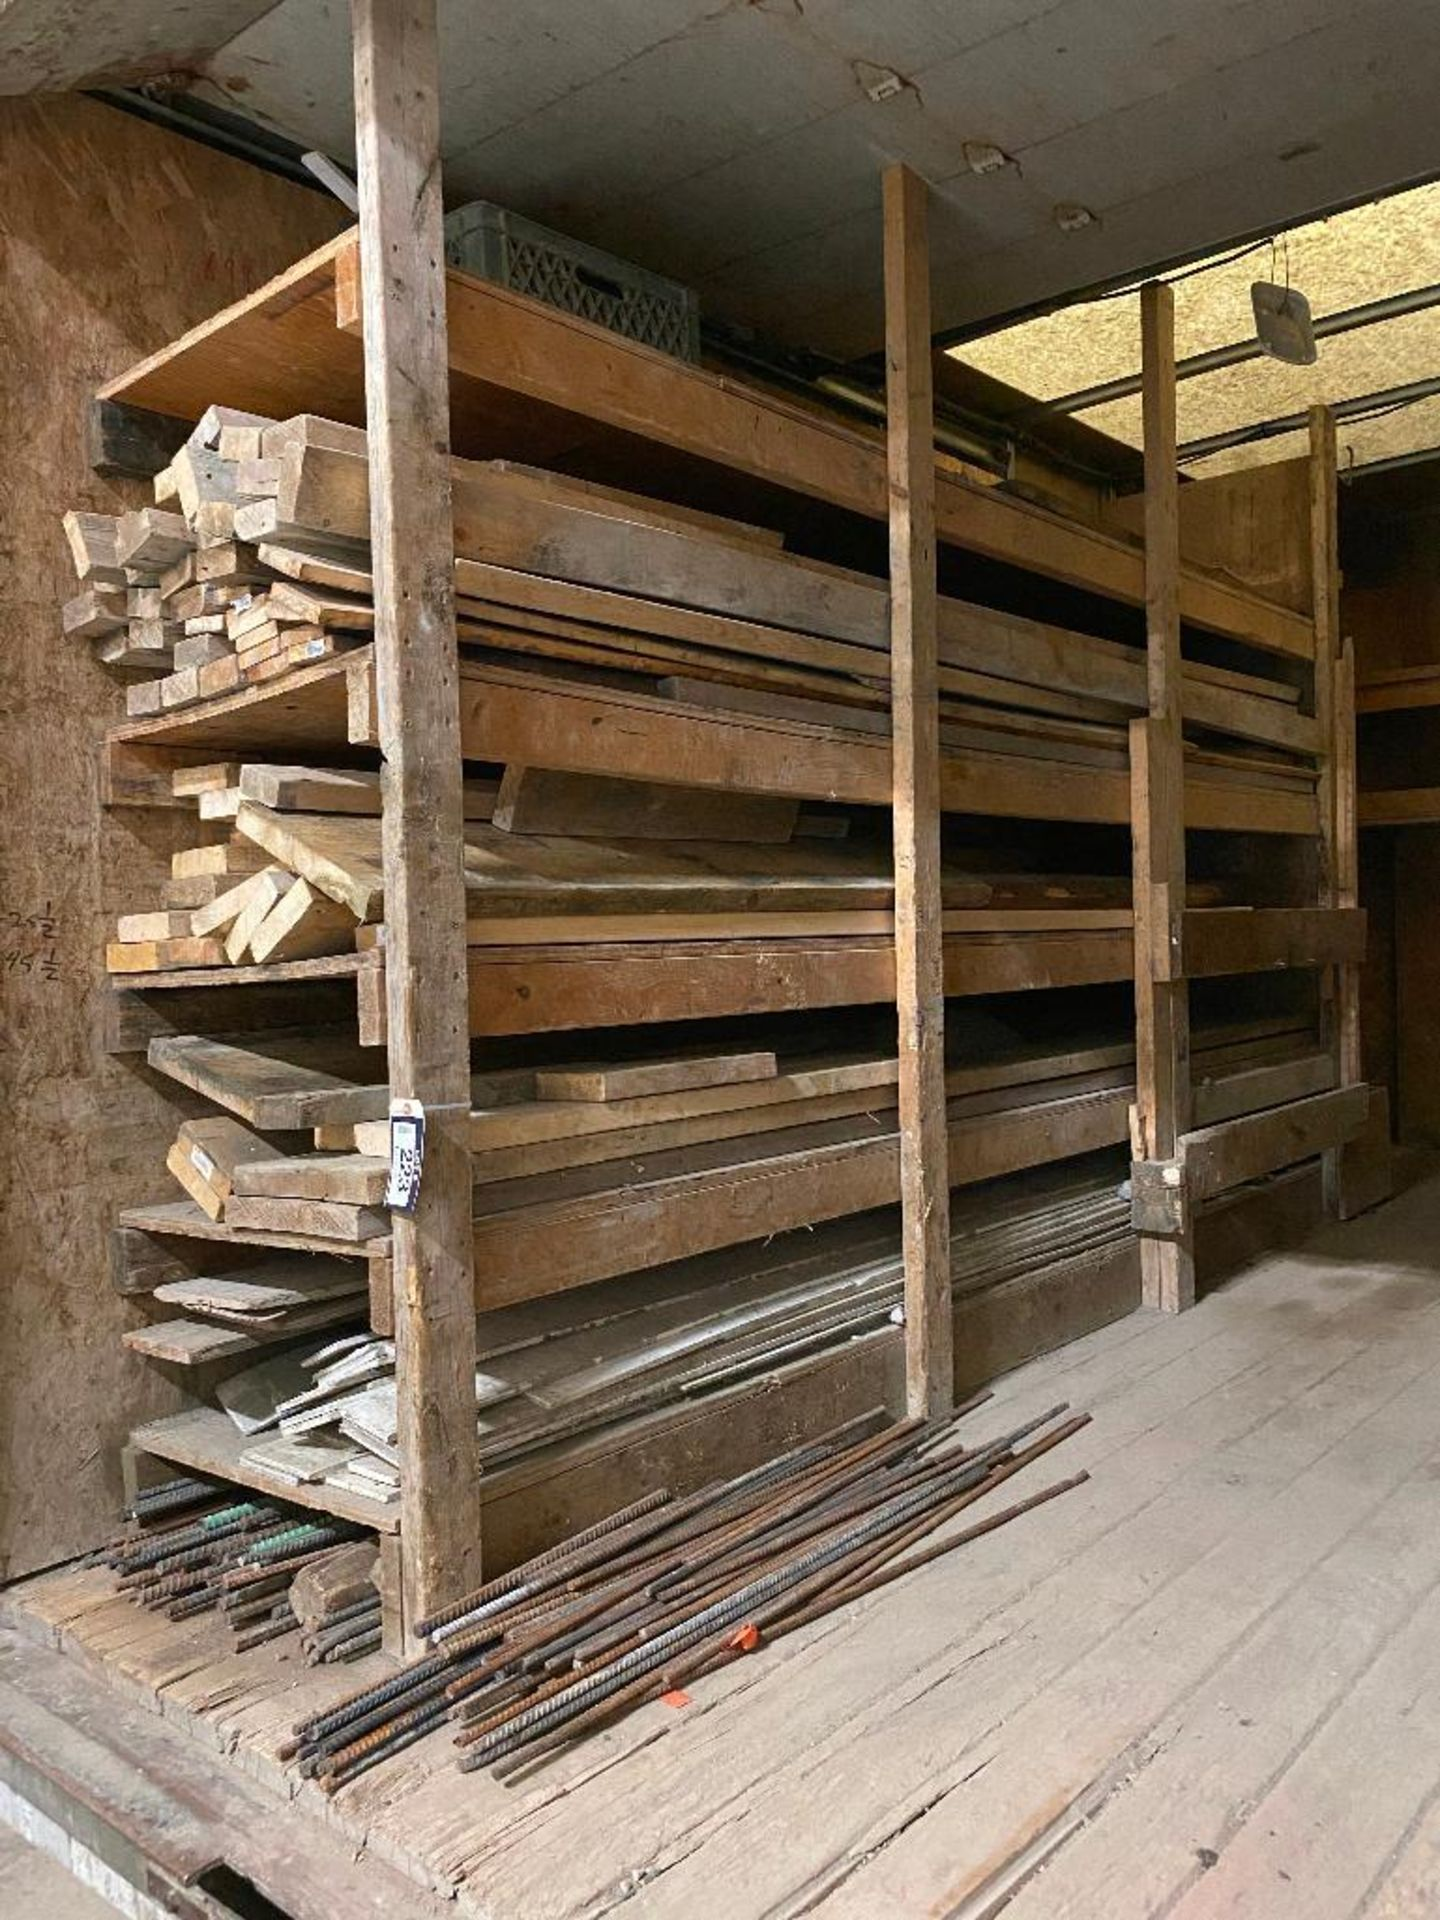 Lot of Asst. Form Lumber and Rebar